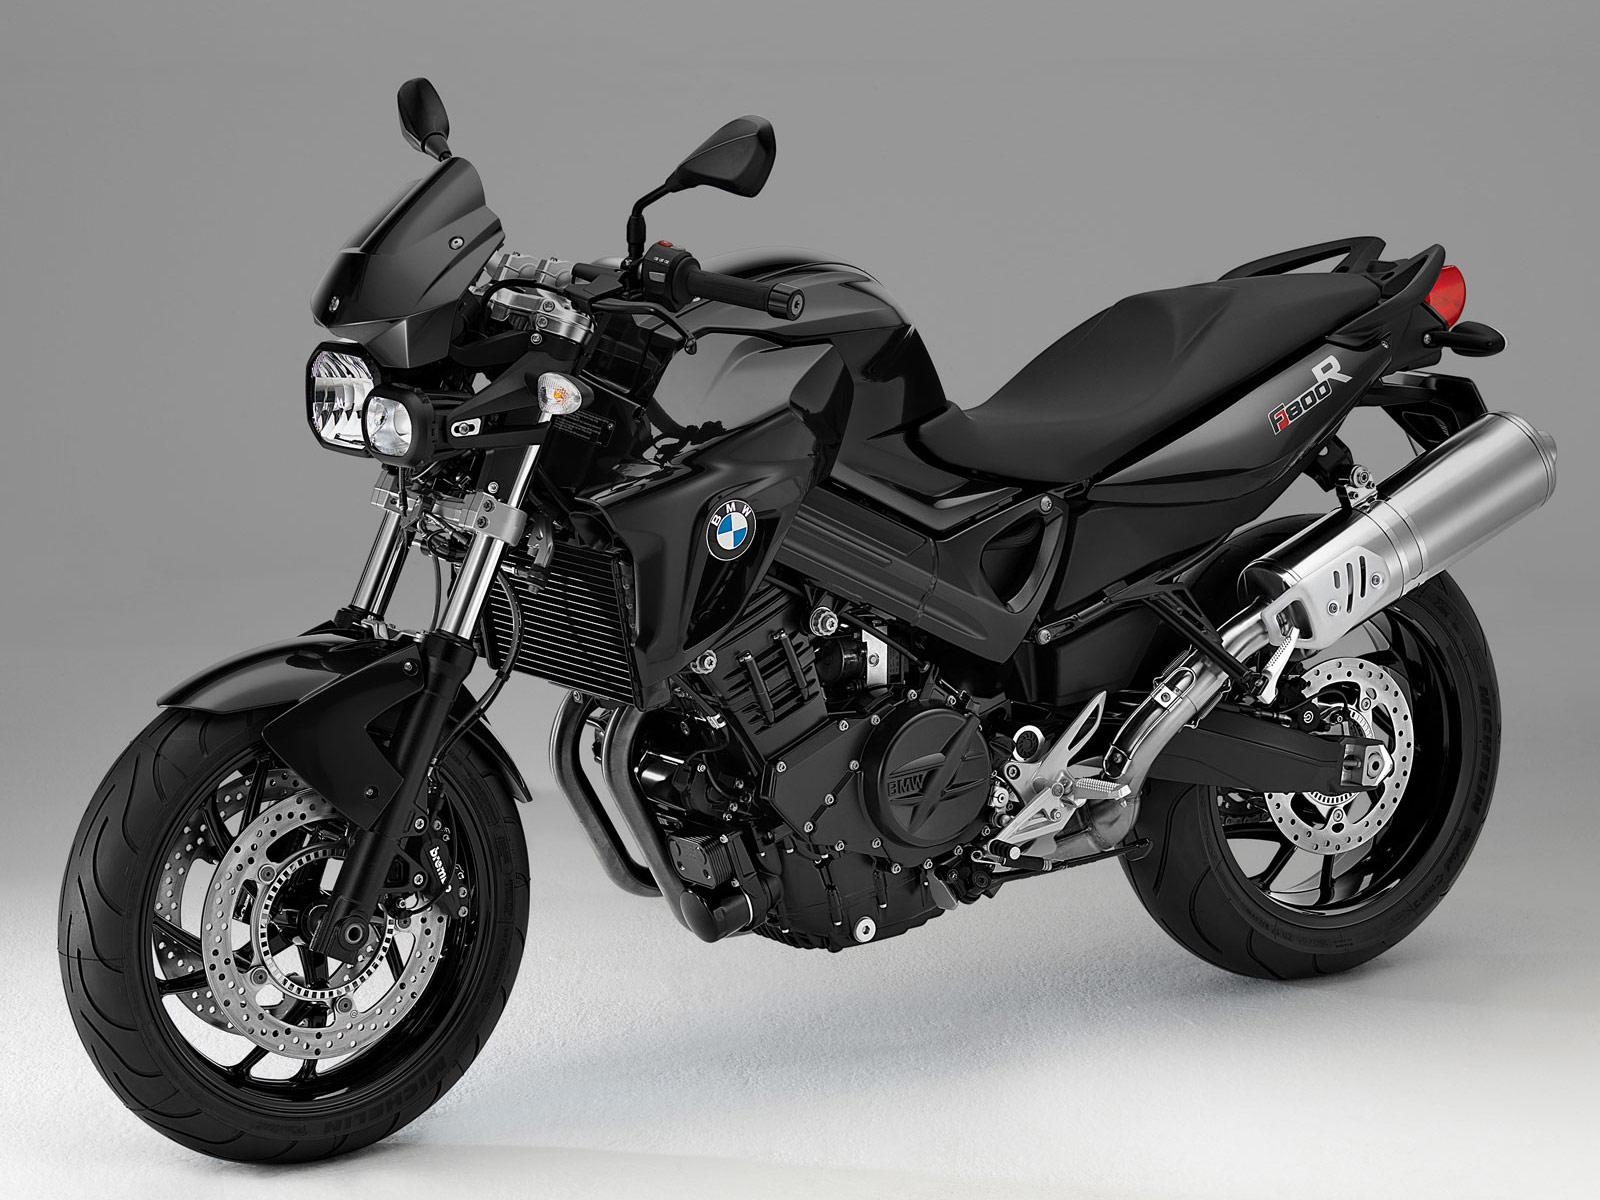 2013 bmw f800r motorcycle insurance information. Black Bedroom Furniture Sets. Home Design Ideas